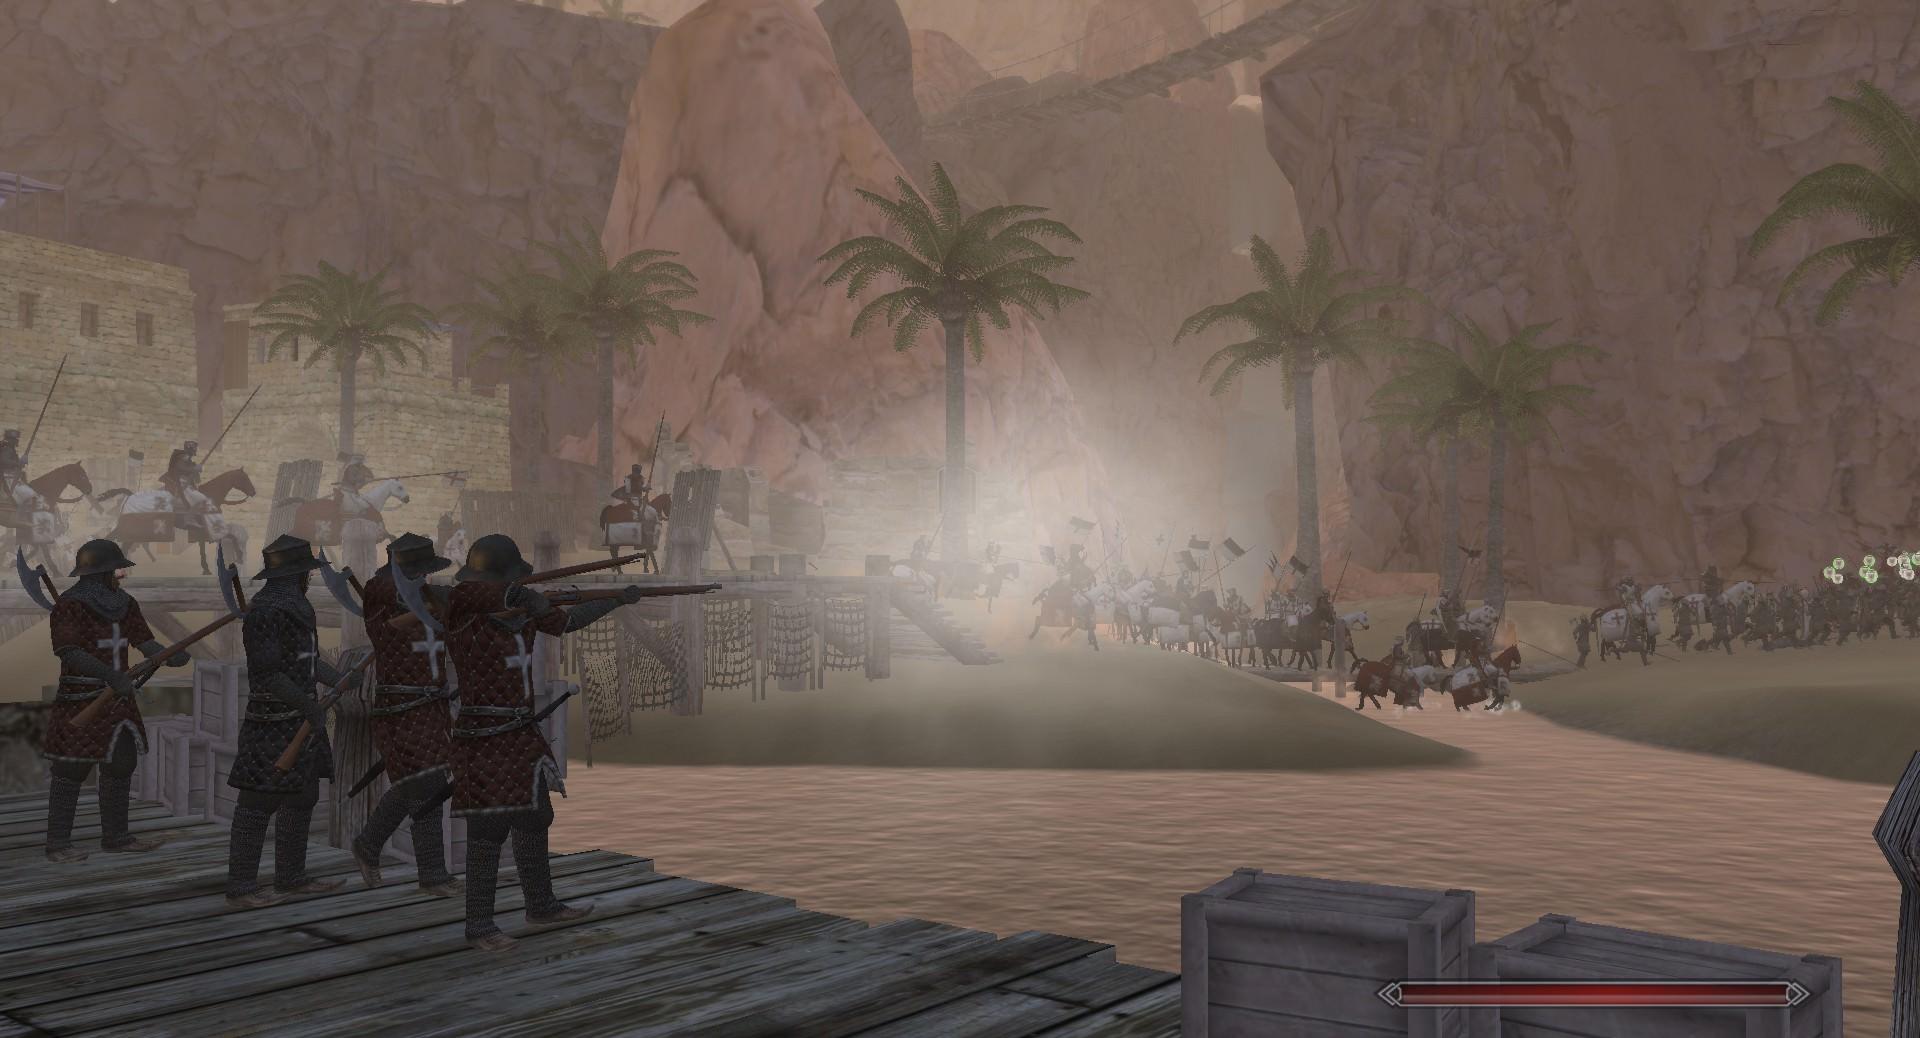 Crusader troops in Full Invasion